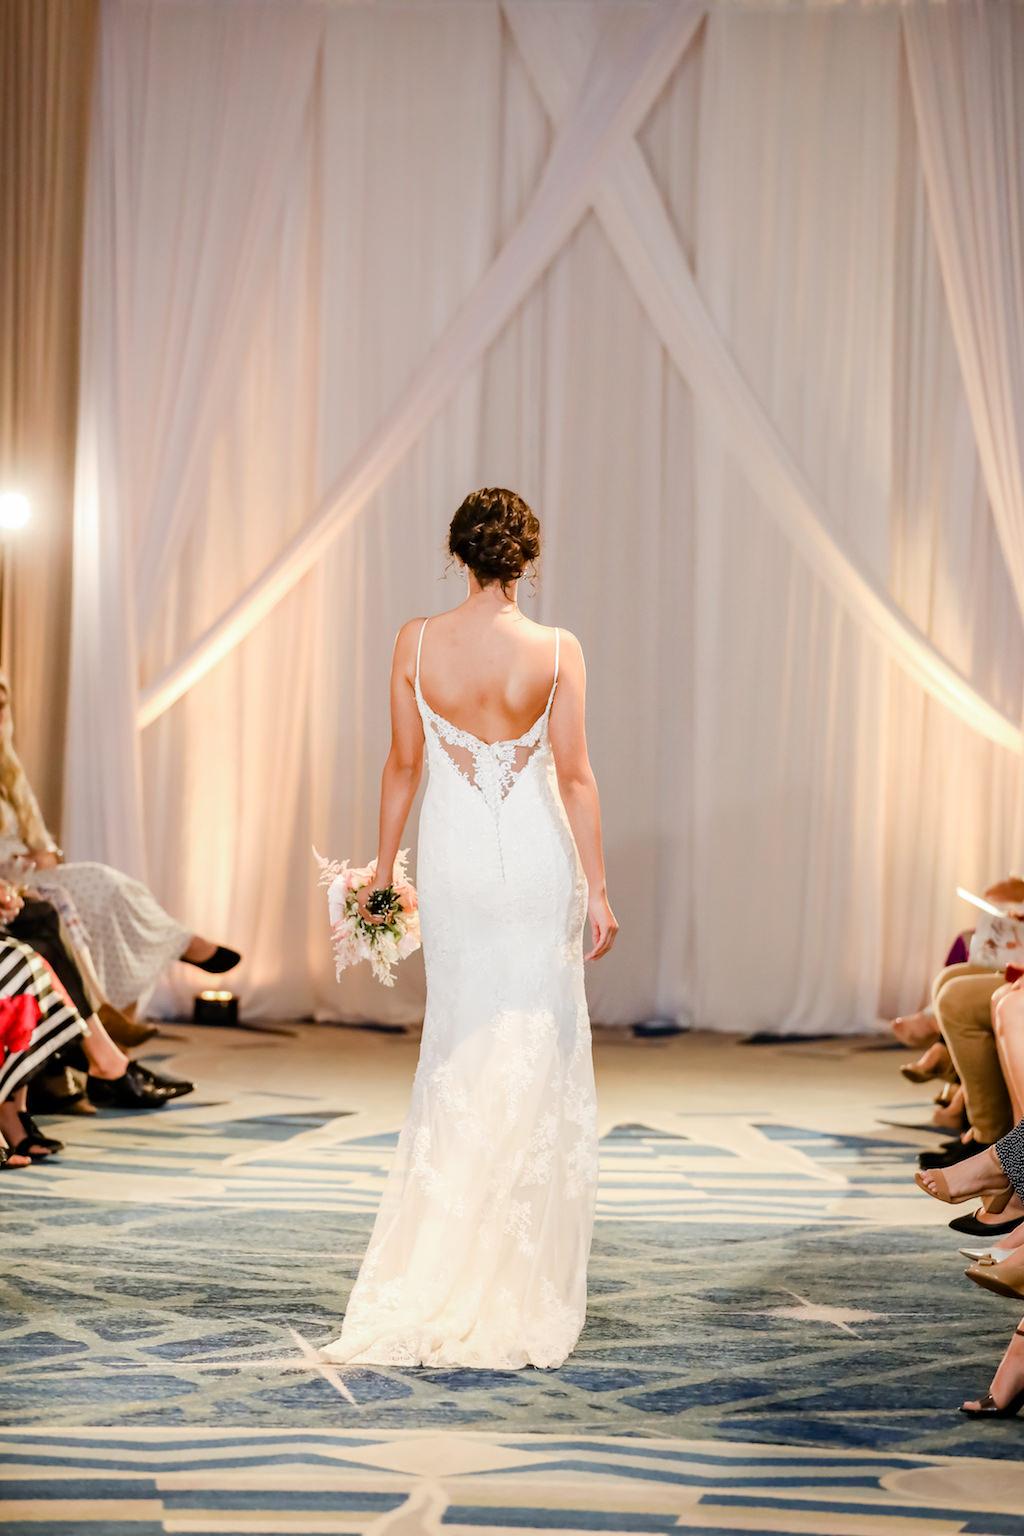 Boho Inspired, Low Back Lace Illusion Wedding Dress   Designer Matthew Christopher   Truly Forever Bridal   The Ritz Carlton Sarasota   Planner NK Weddings